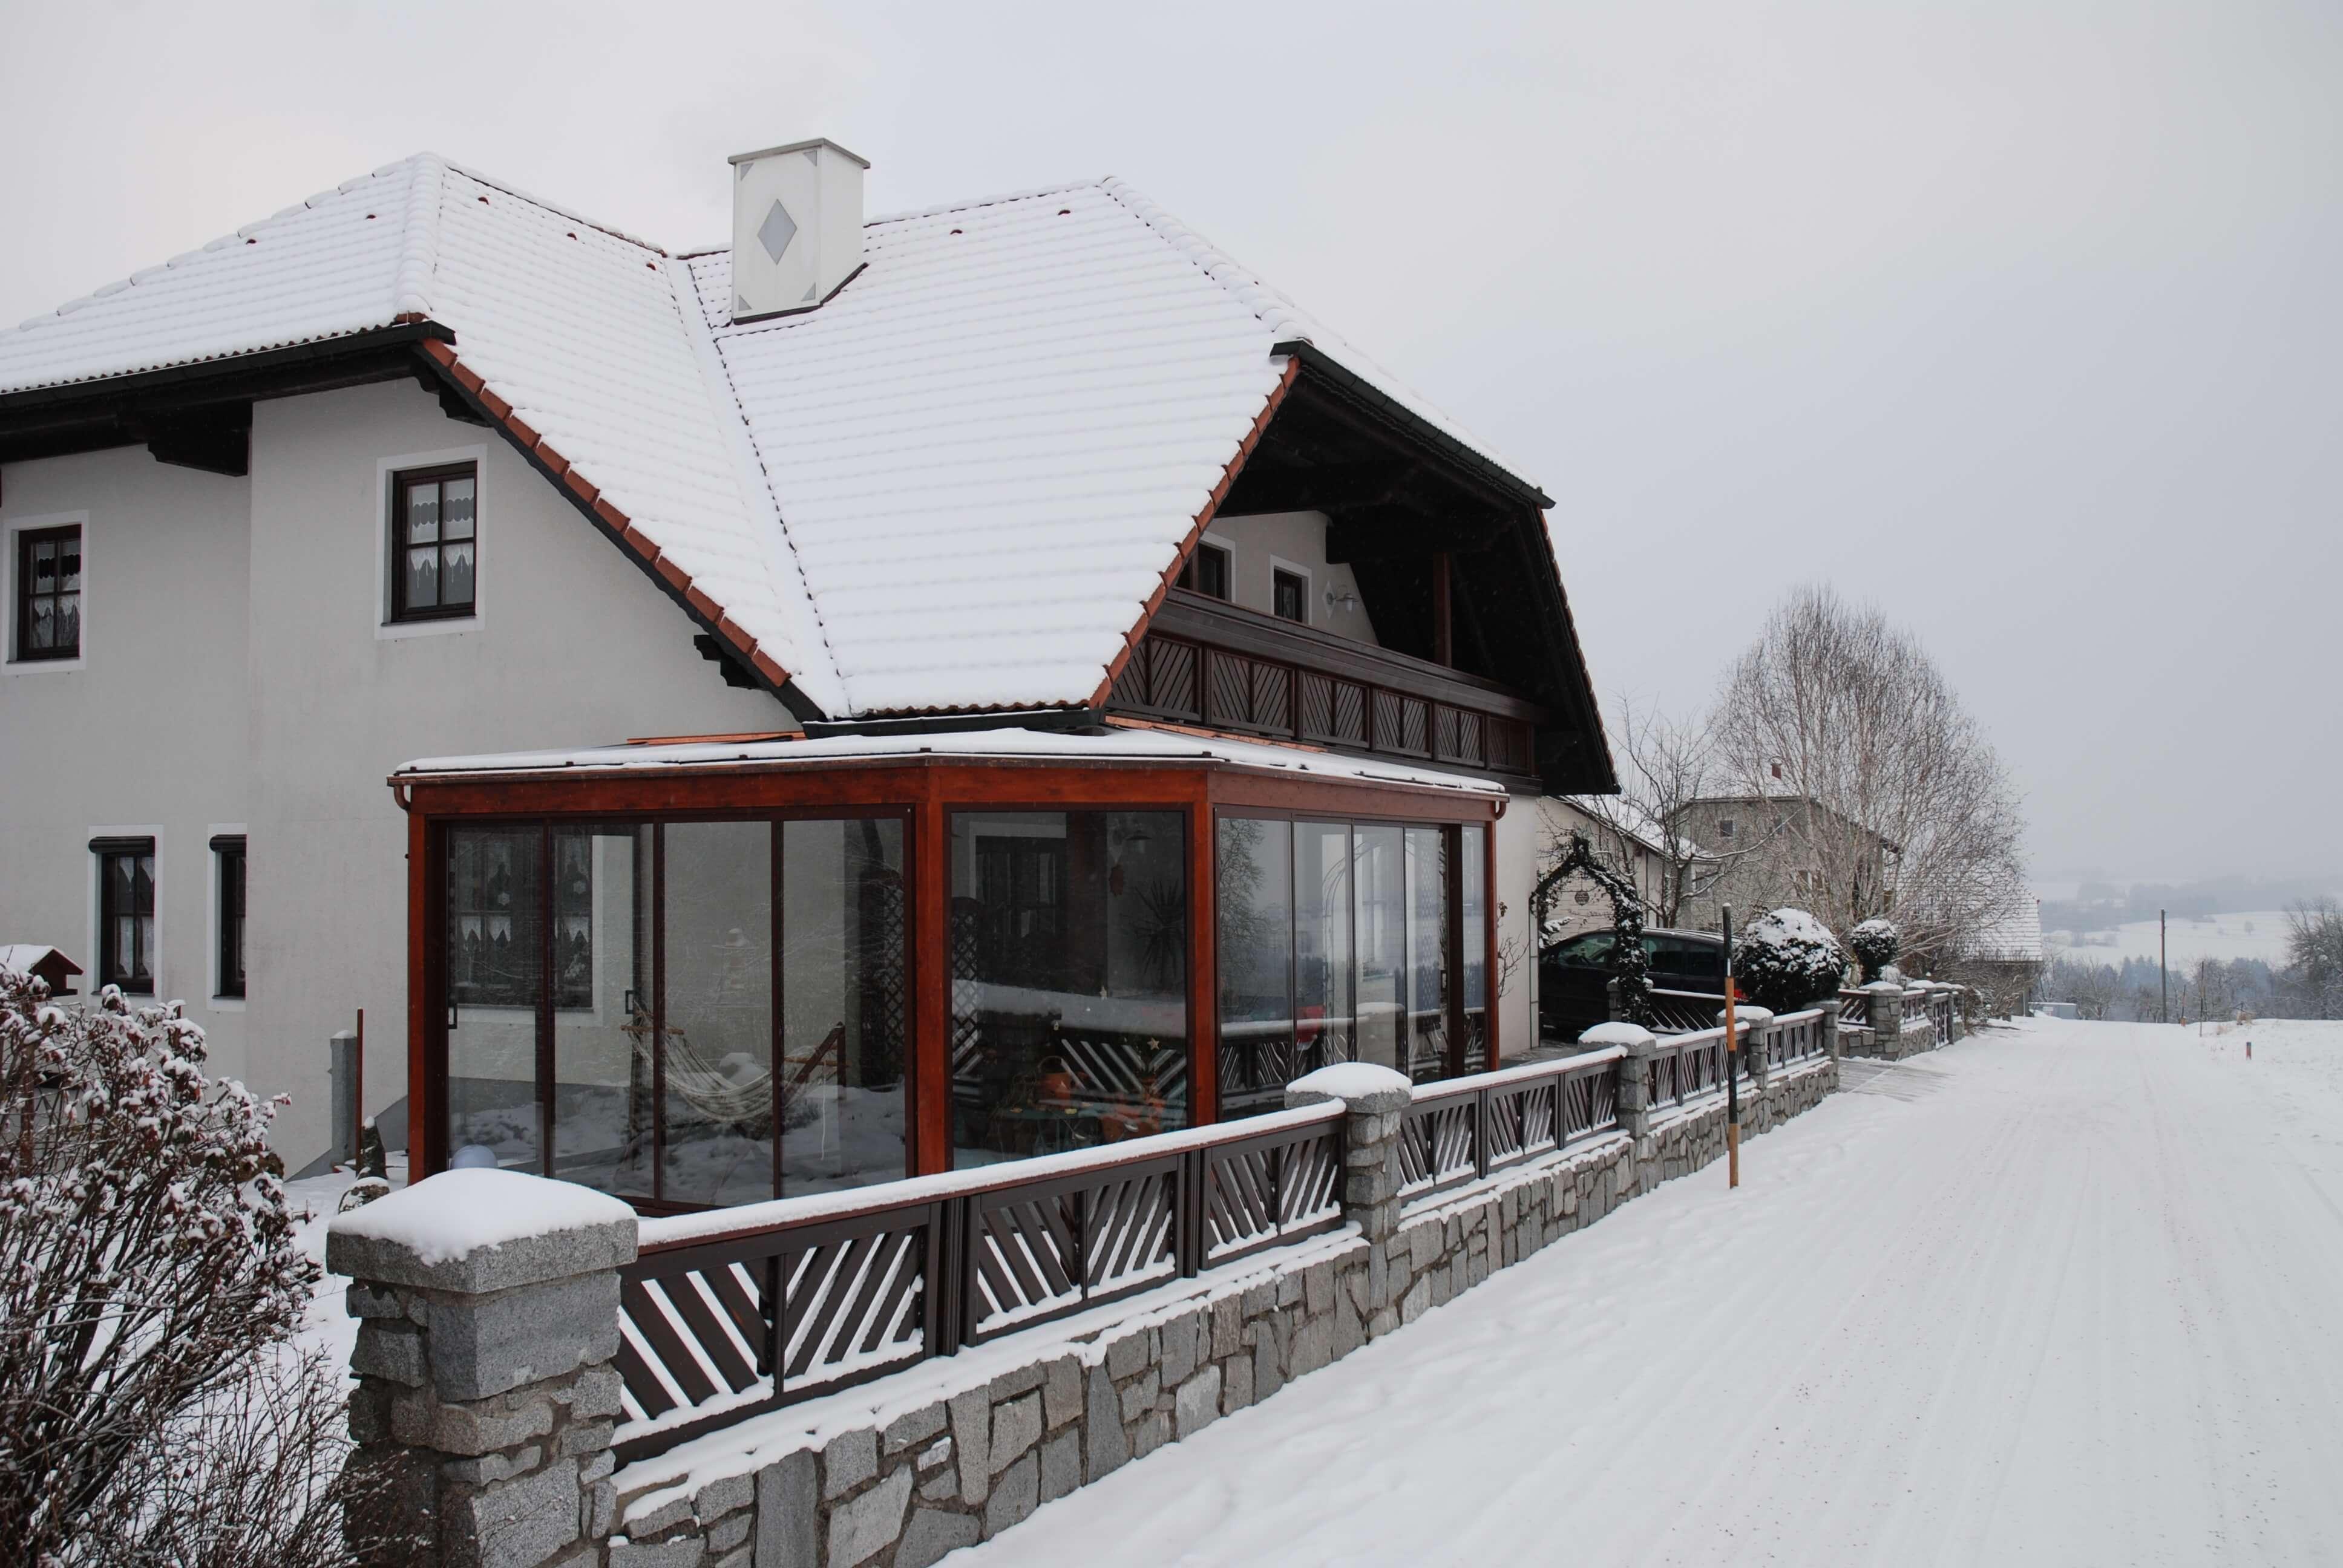 Wintergarten Dachverglasung wintergarten mit dachverglasung fenster schmidinger oö